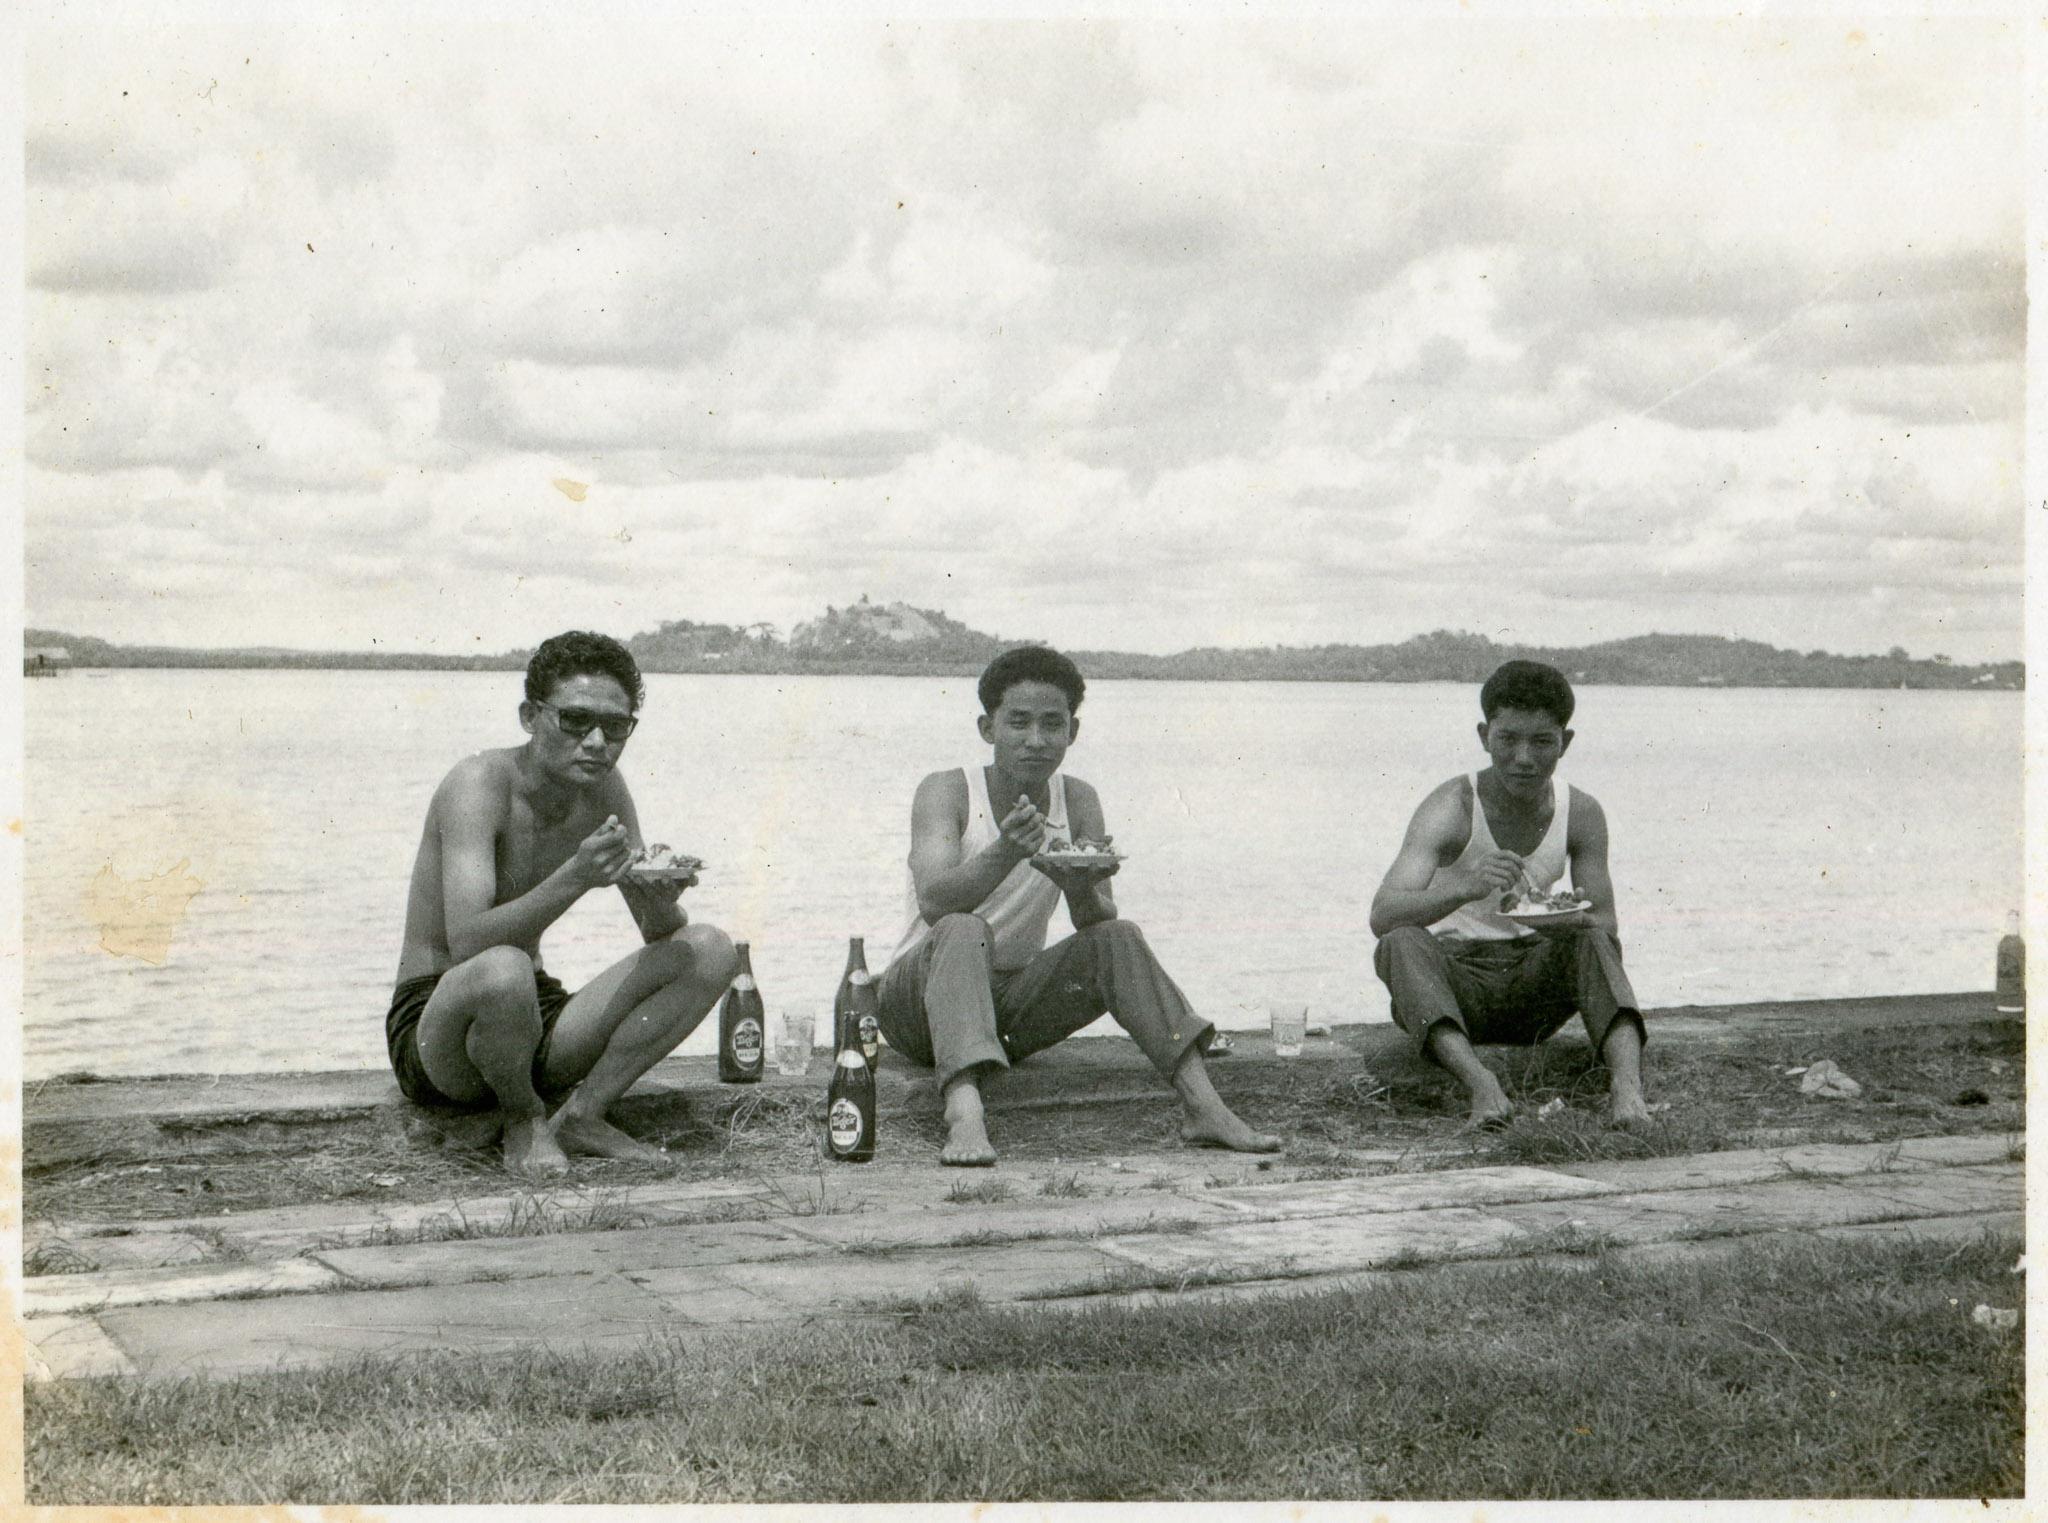 singapore-gurkhas-archive-photo-museum-zakaria-zainal-36.jpg